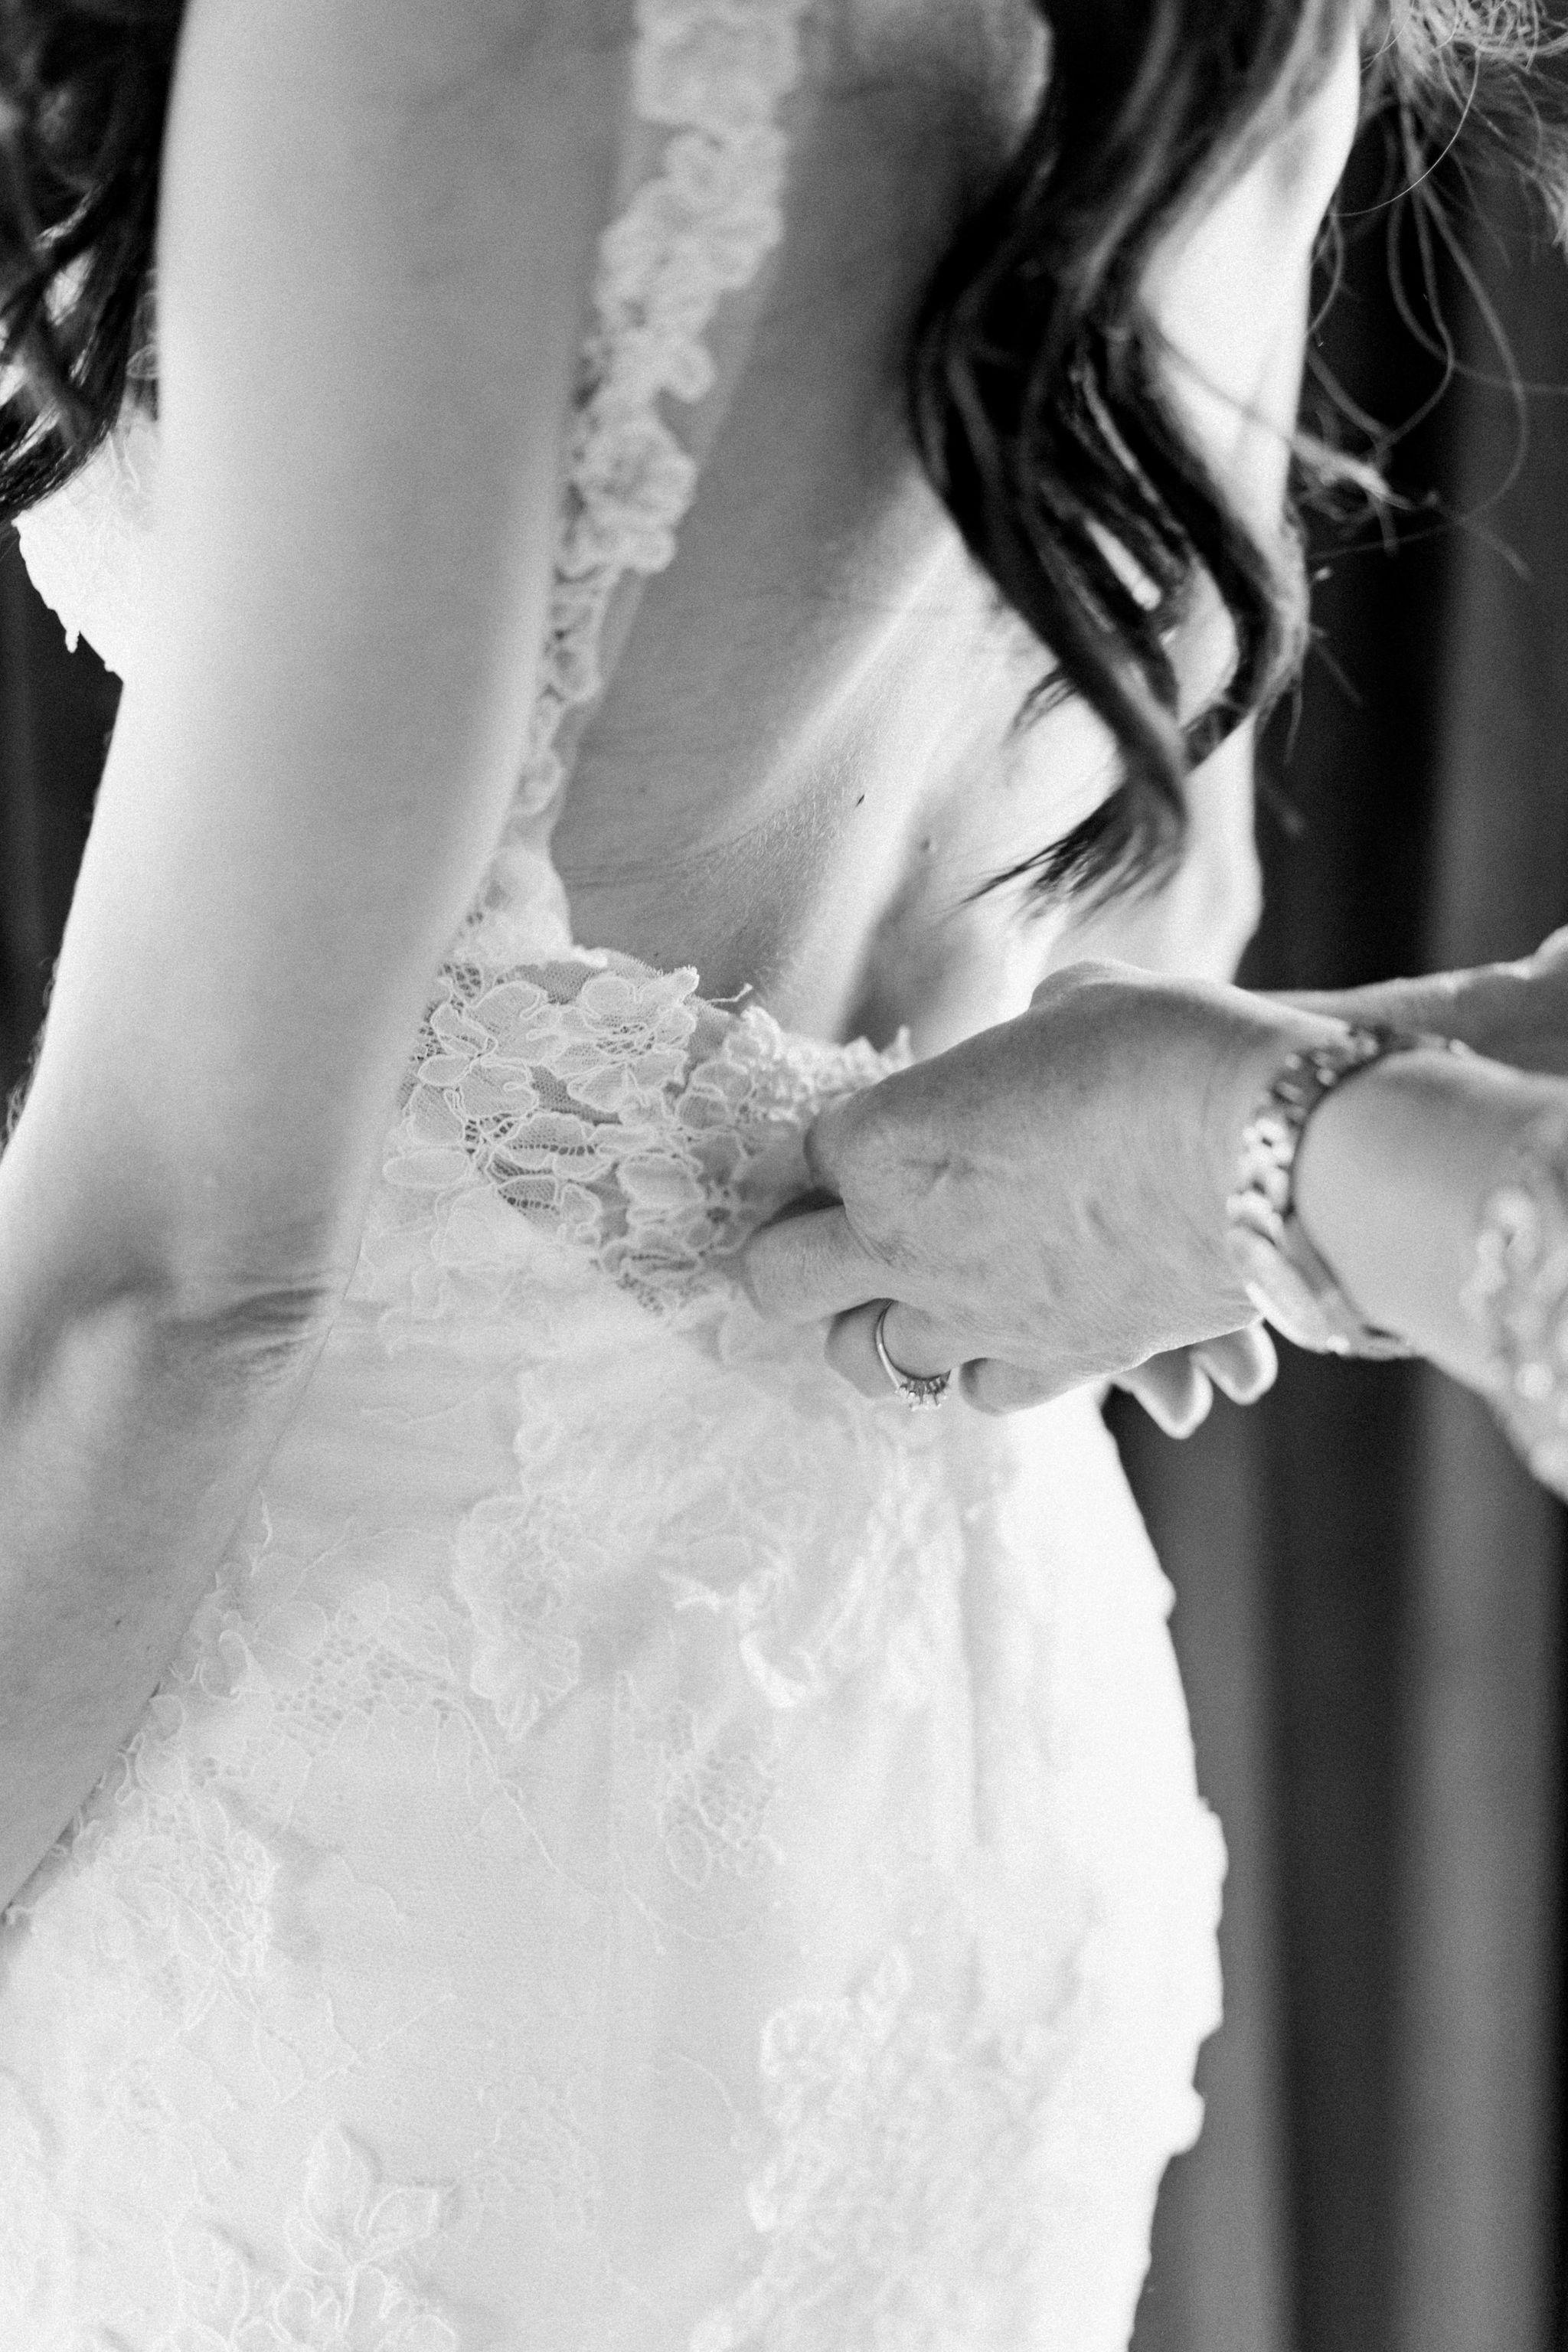 0116-artiese-evergreen-brickworks-wedding-ashleycraig-03044.jpg